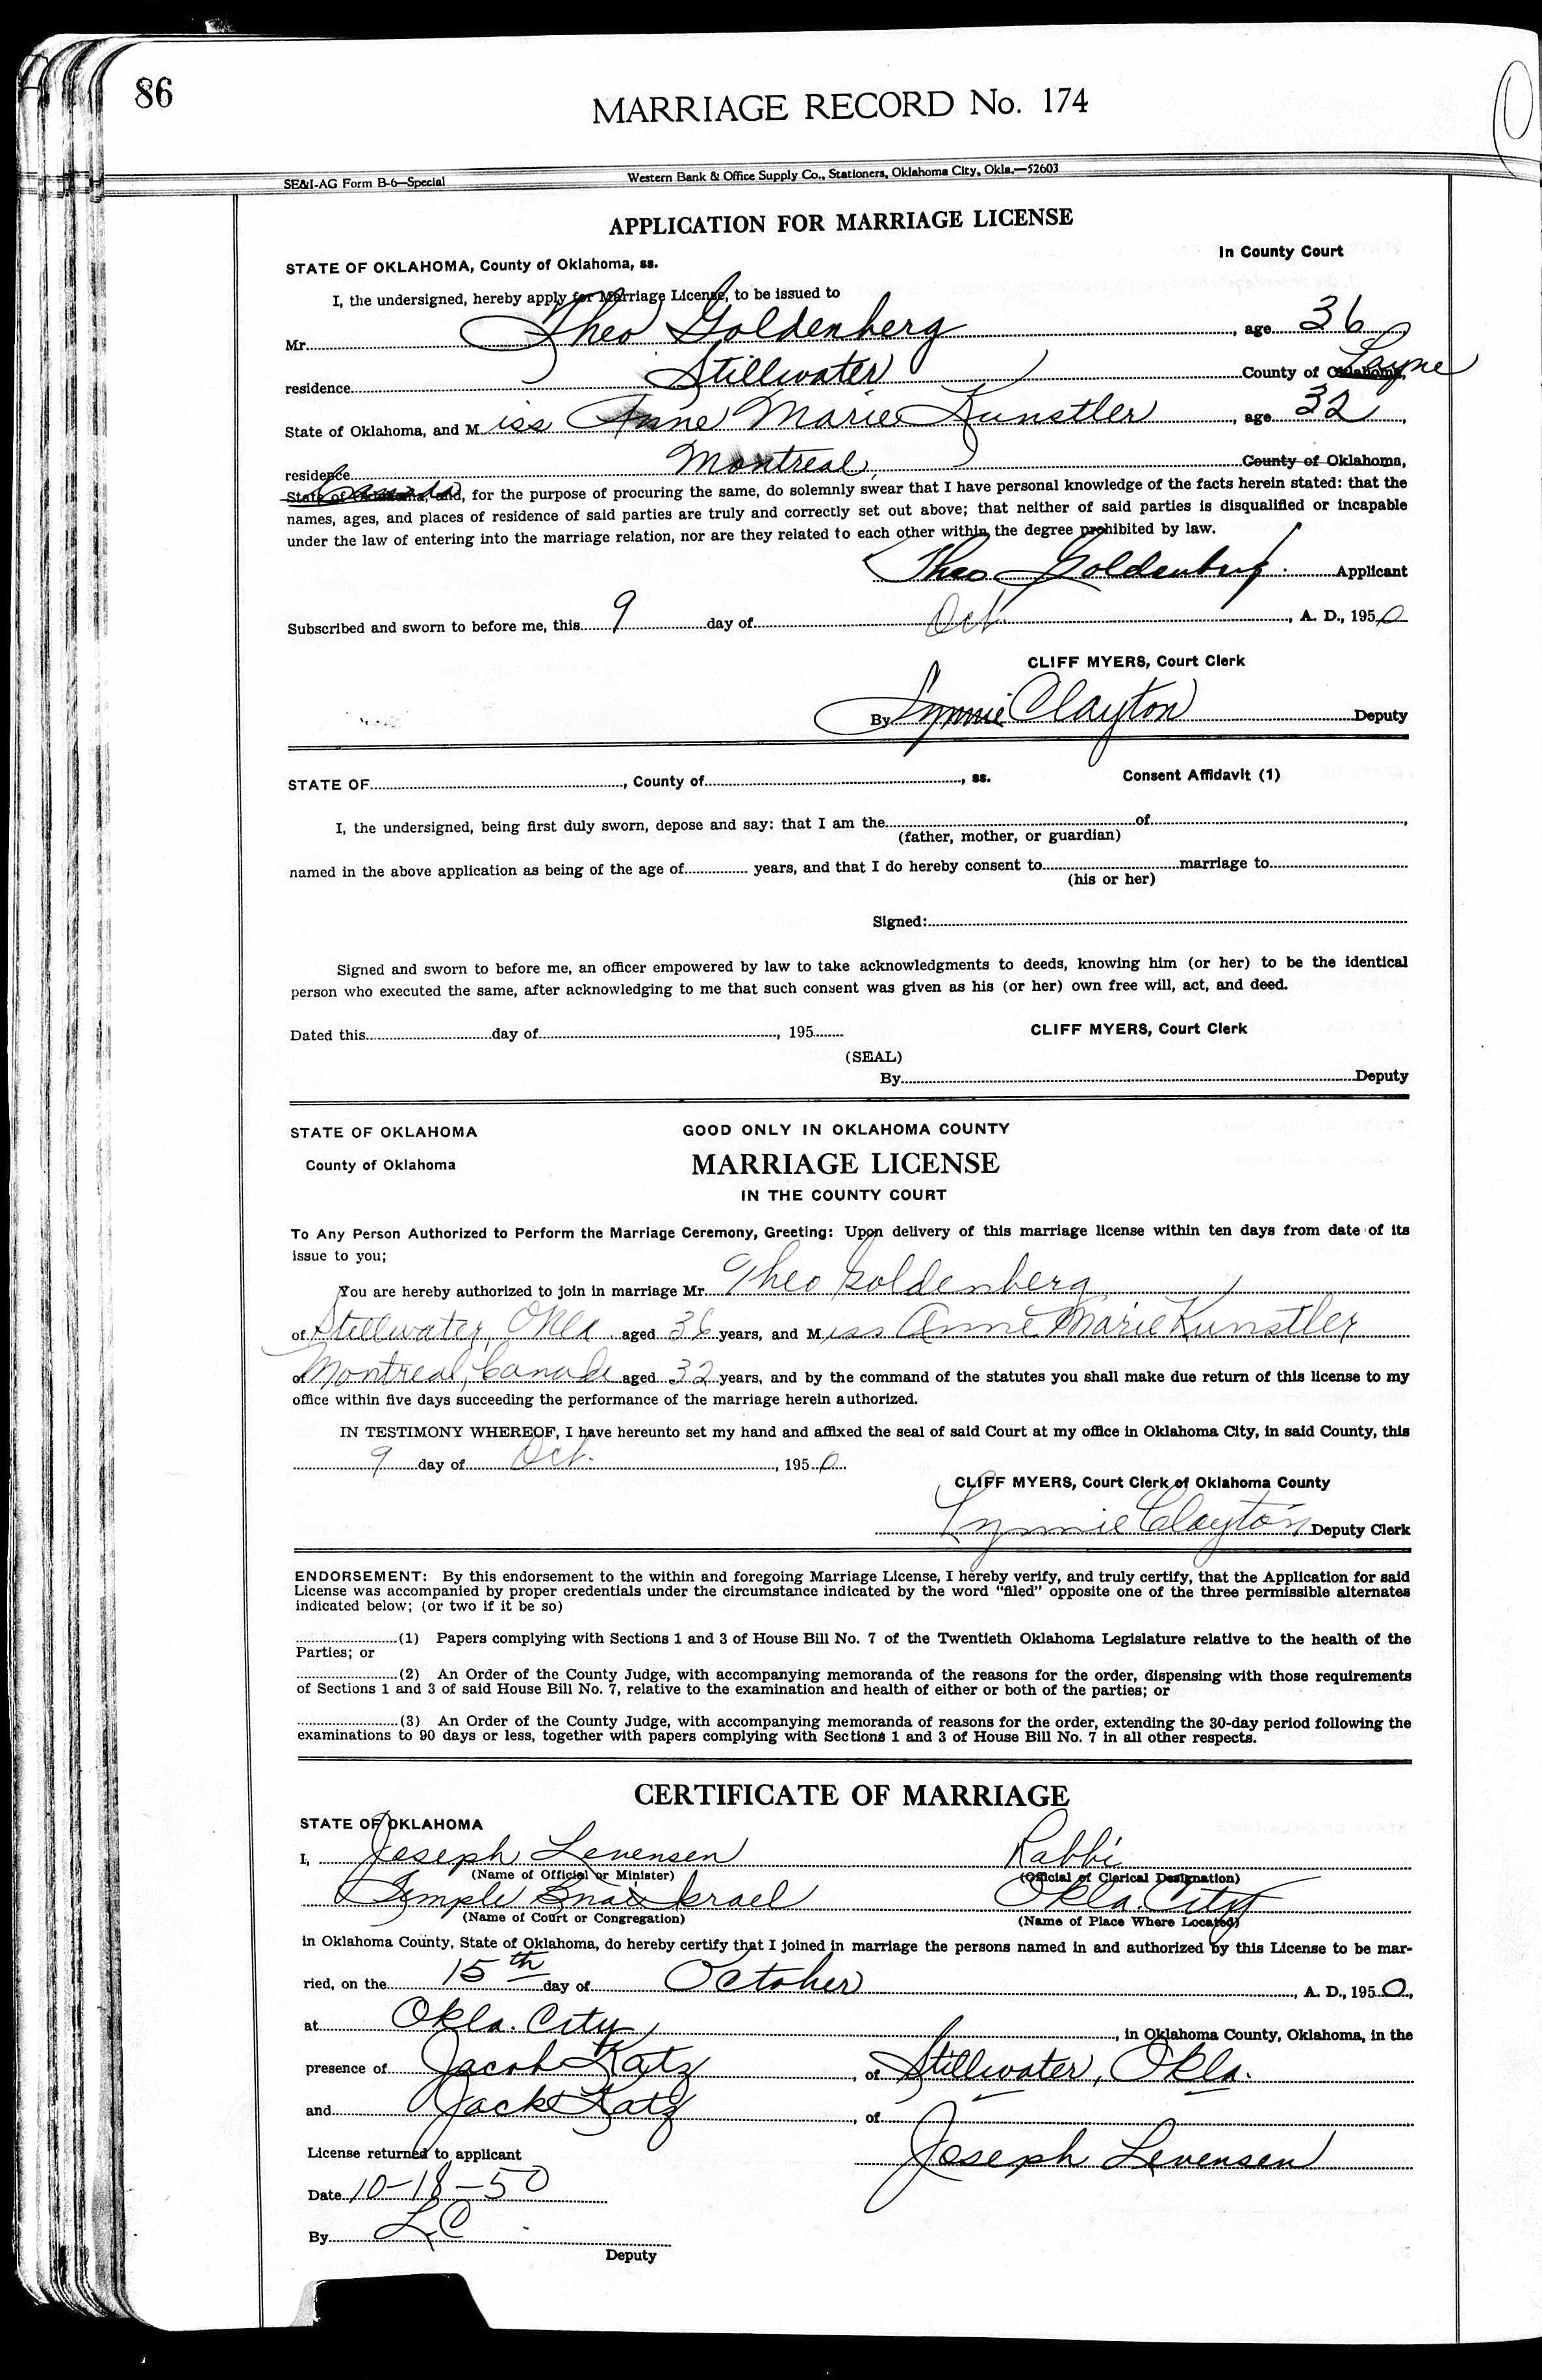 Stillwater brotmanblog a family journey oklahoma county marriages 1890 1995 database on line original data marriage records oklahoma marriages familysearch salt lake city ut aiddatafo Gallery